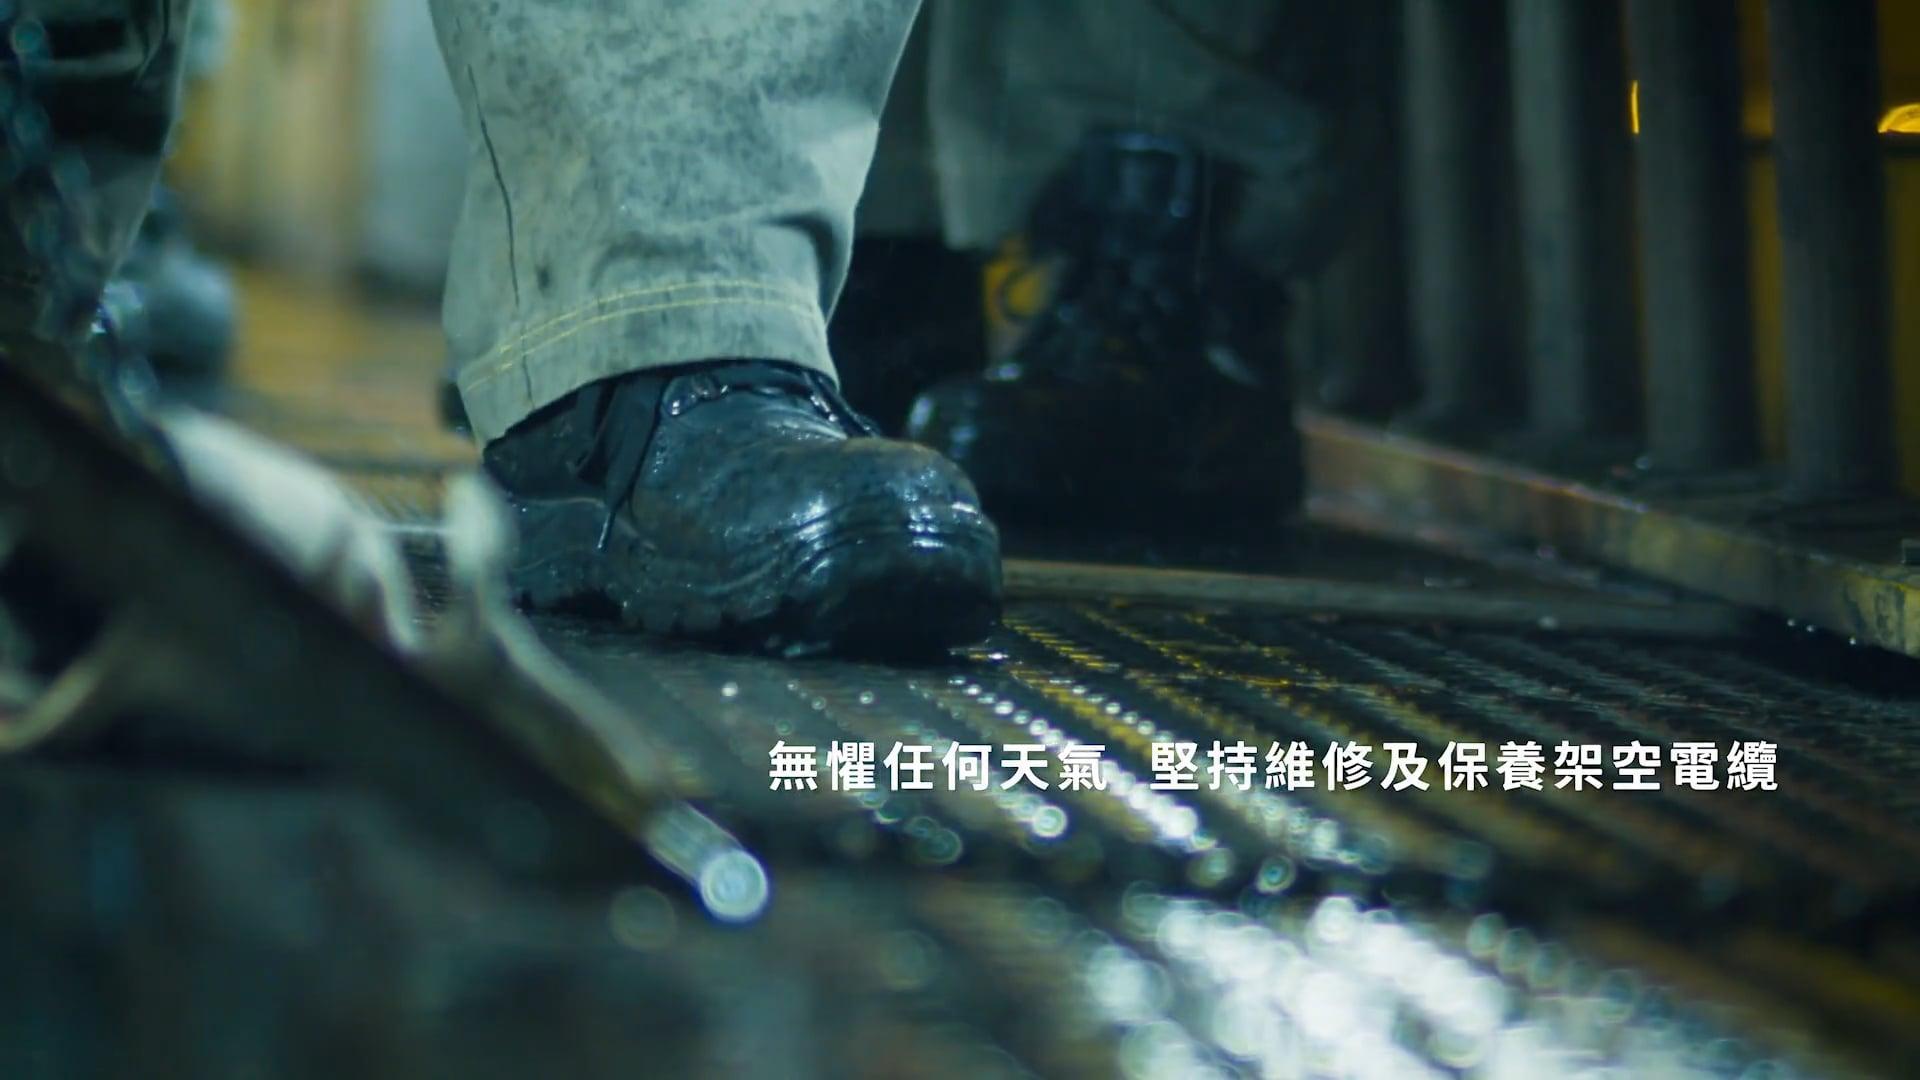 【MTR 默默服務每分秒】電纜篇